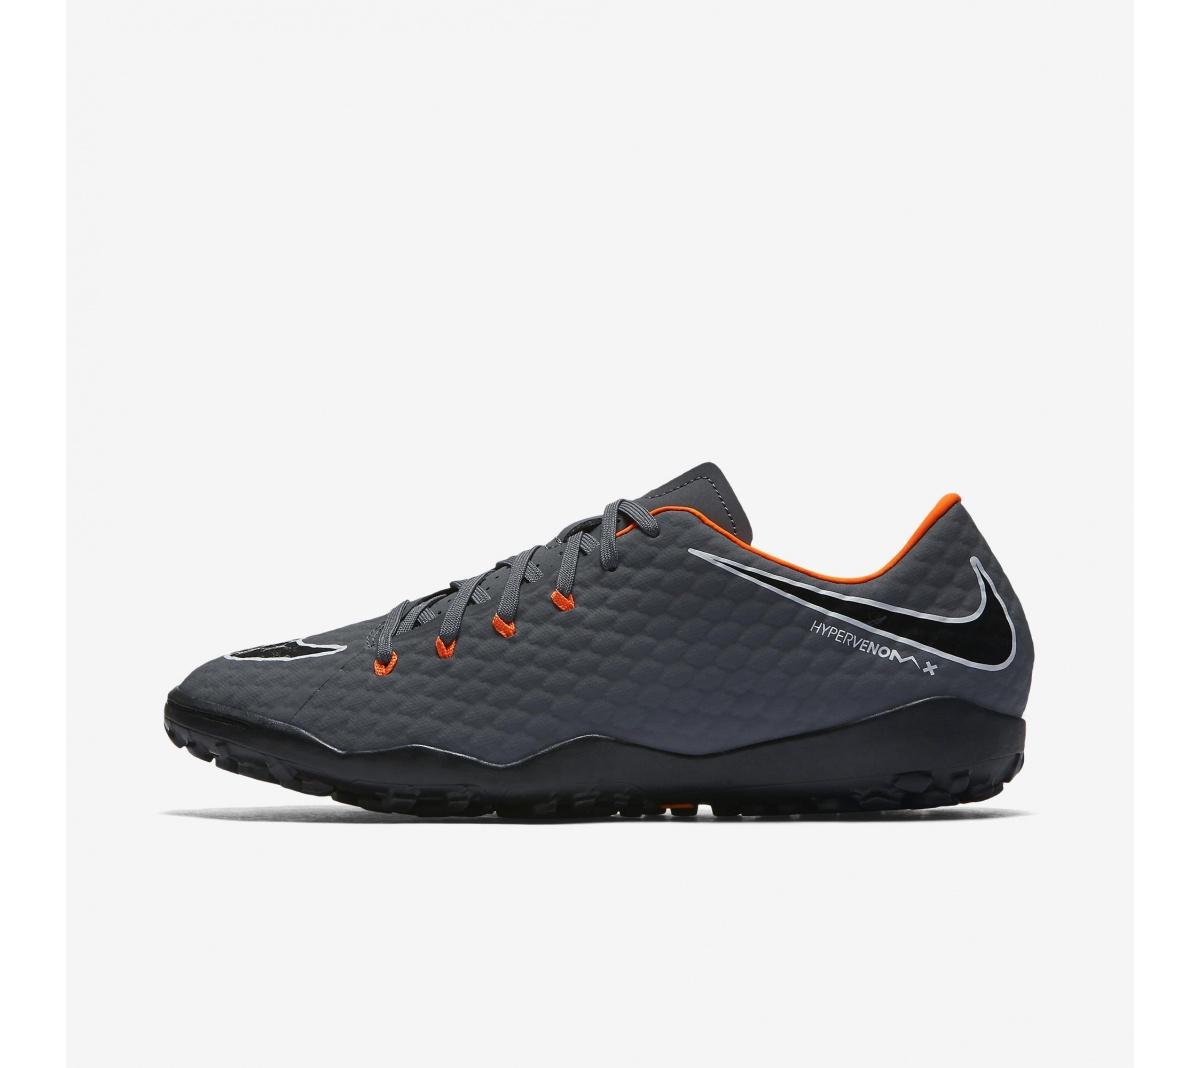 Chuteira Nike Hypervenom PhantomX 3 Academy TF